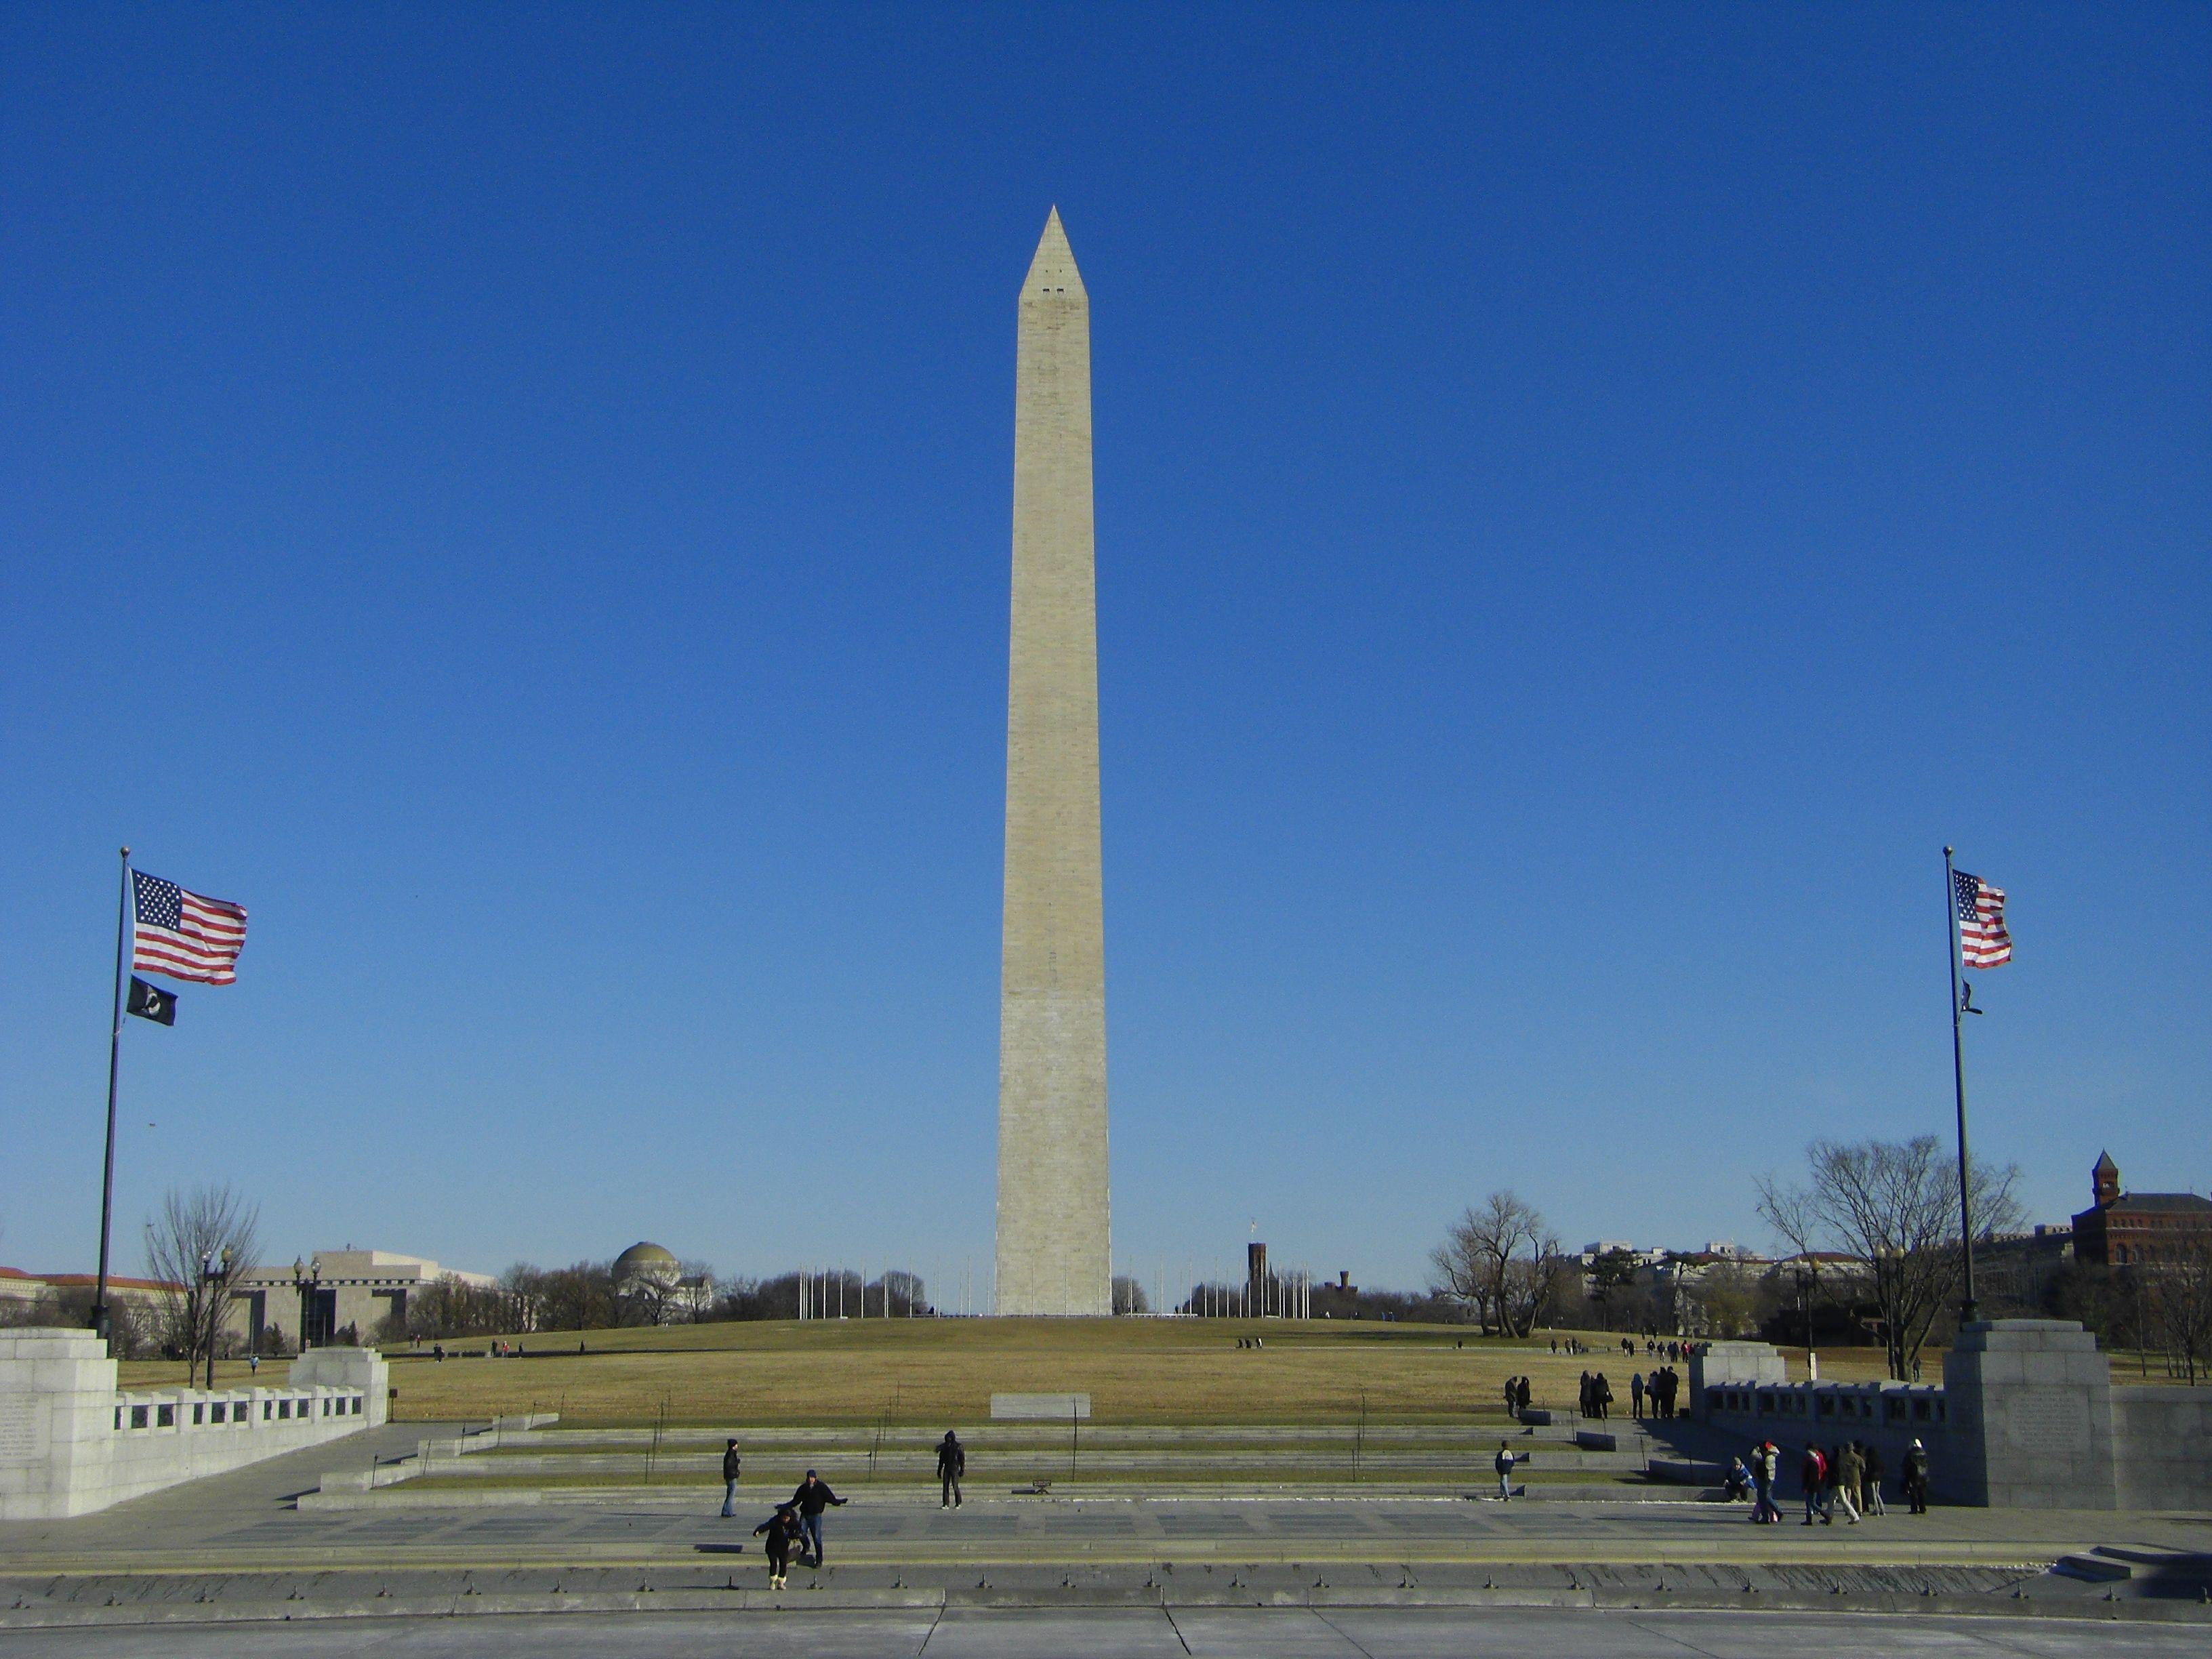 Washington Monument (Washington DC) - consejos útiles antes de salir - TripAdvisor